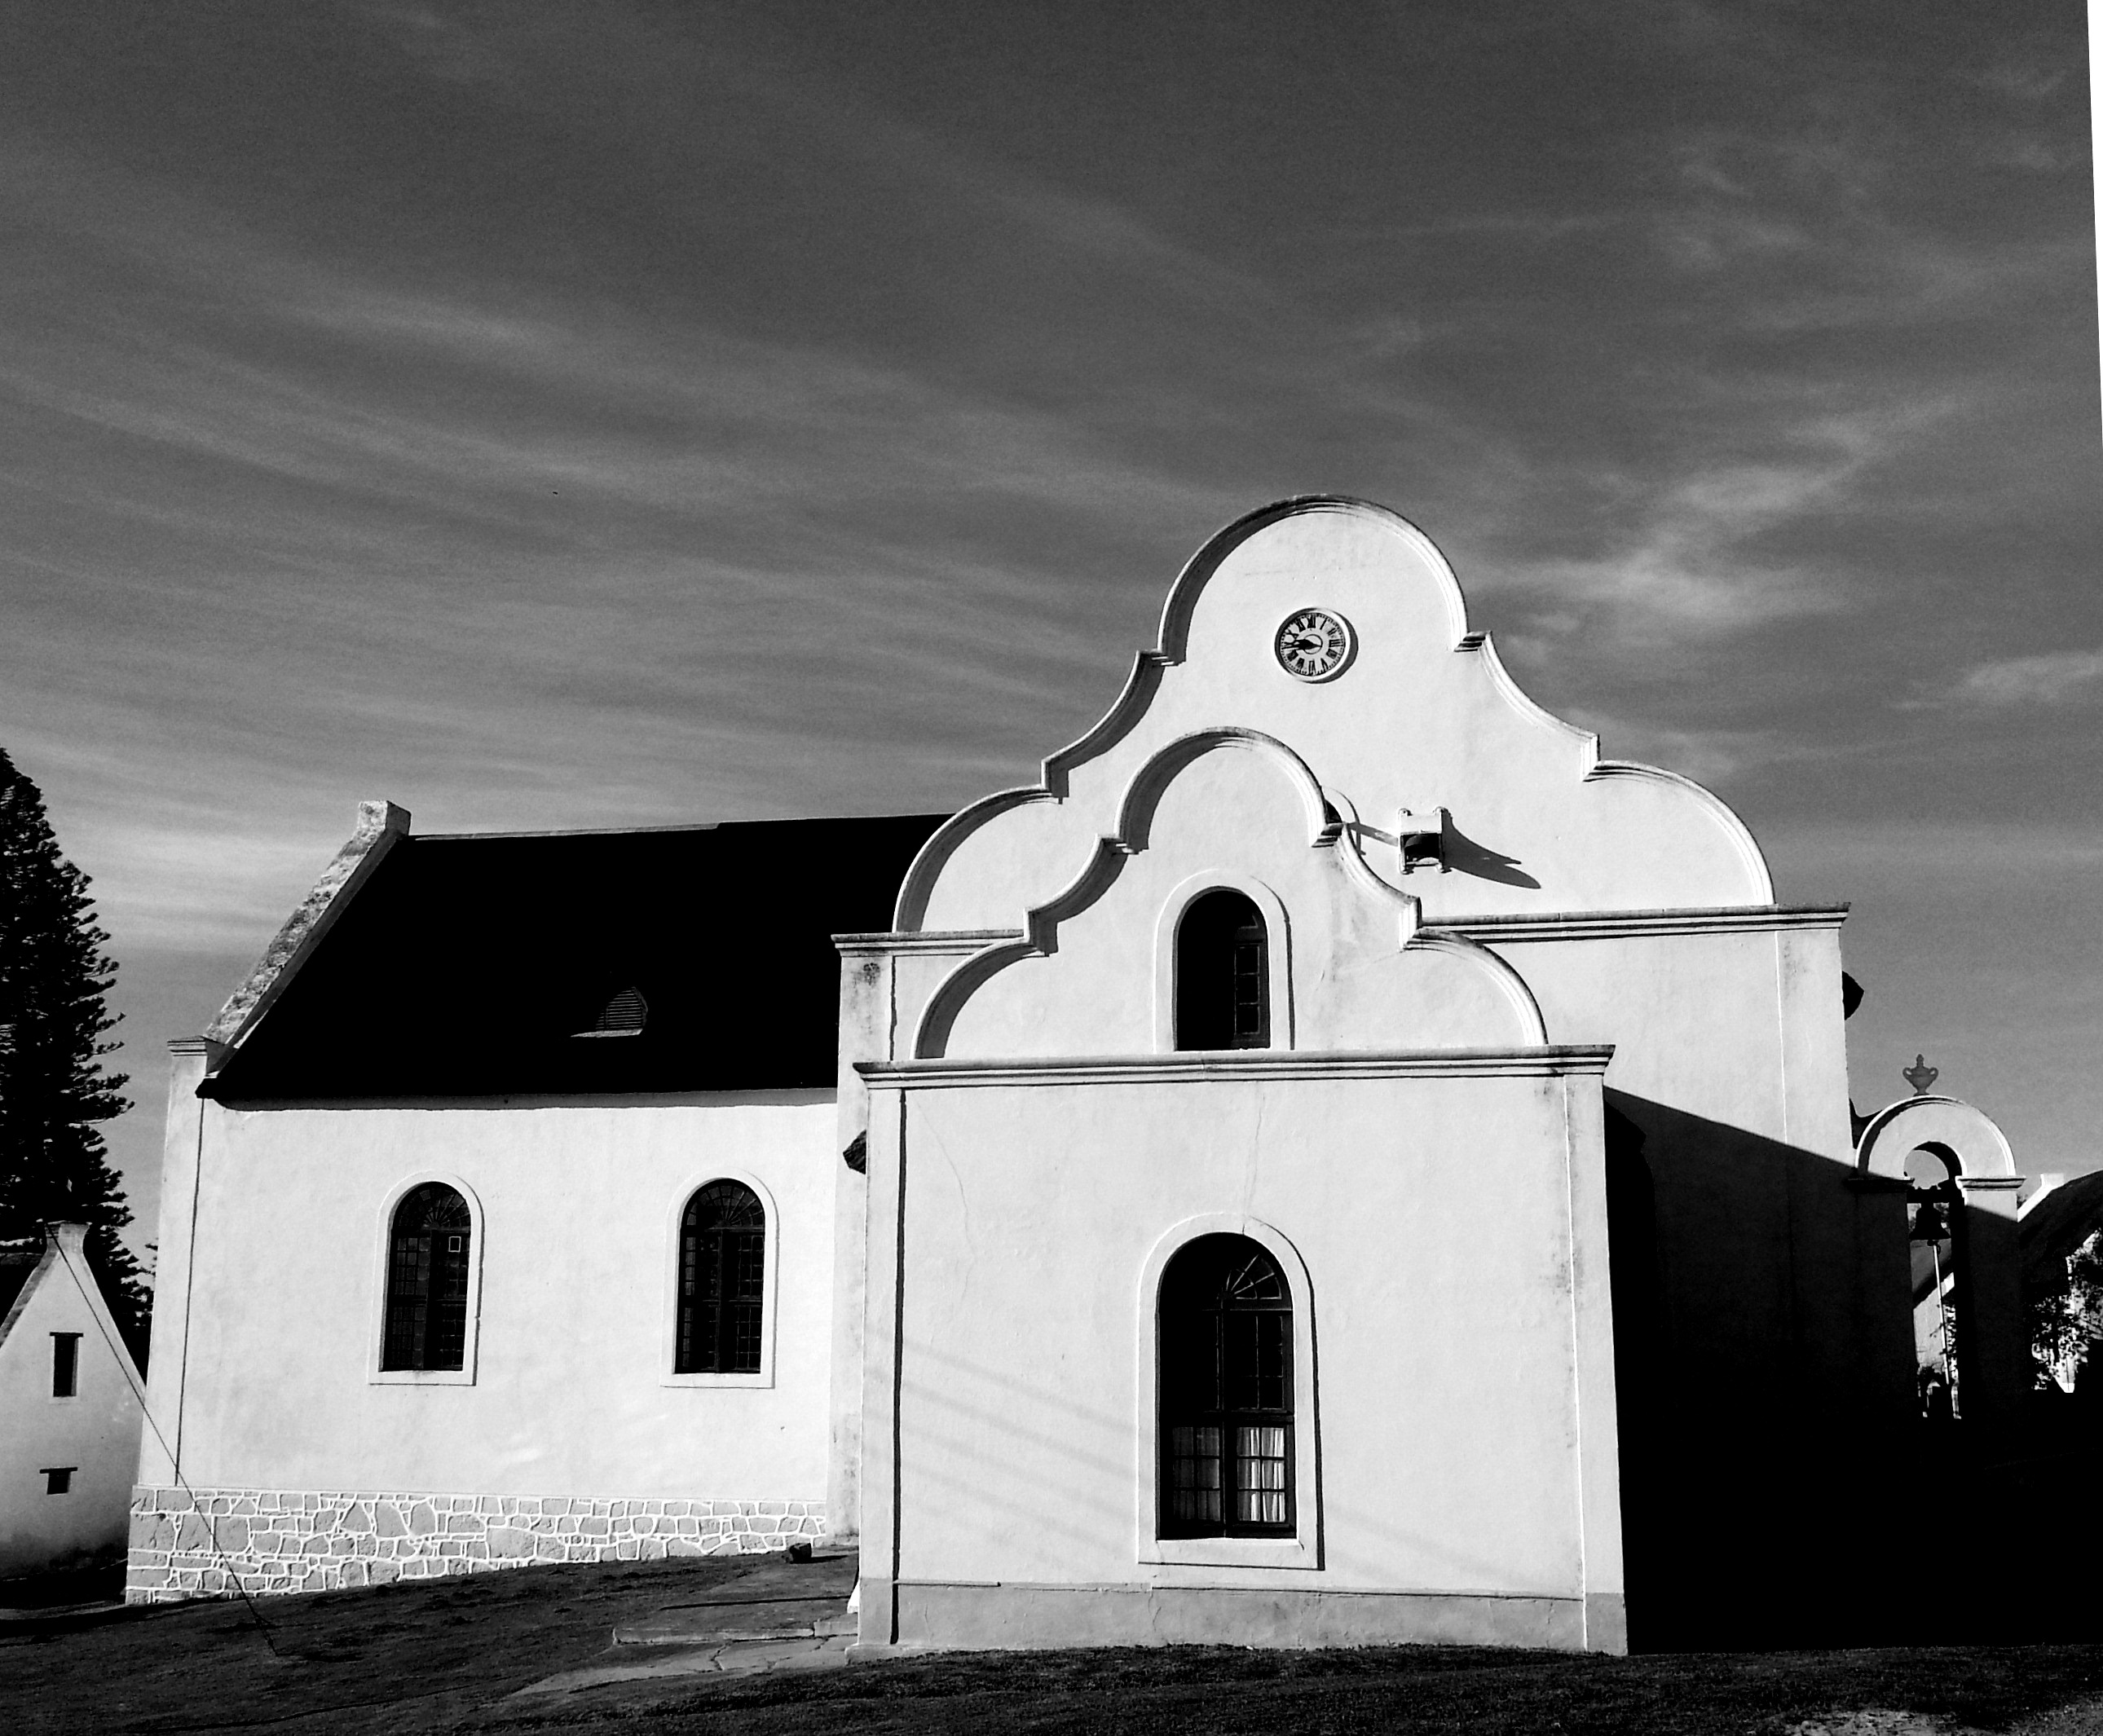 Historic Photo of Elim Mission Station